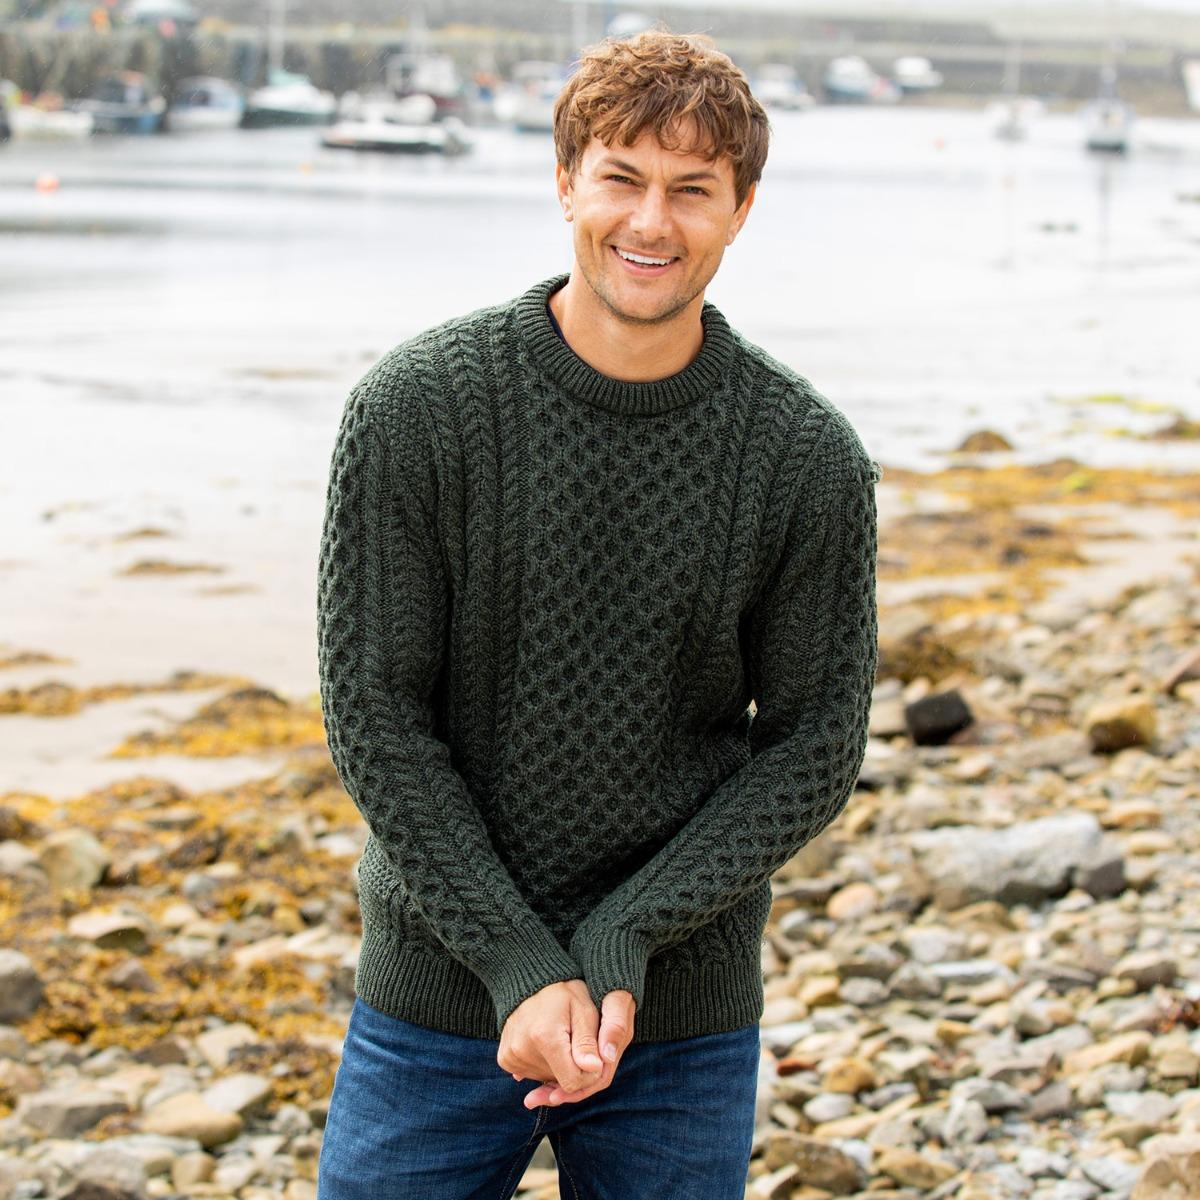 Aran sweater for him